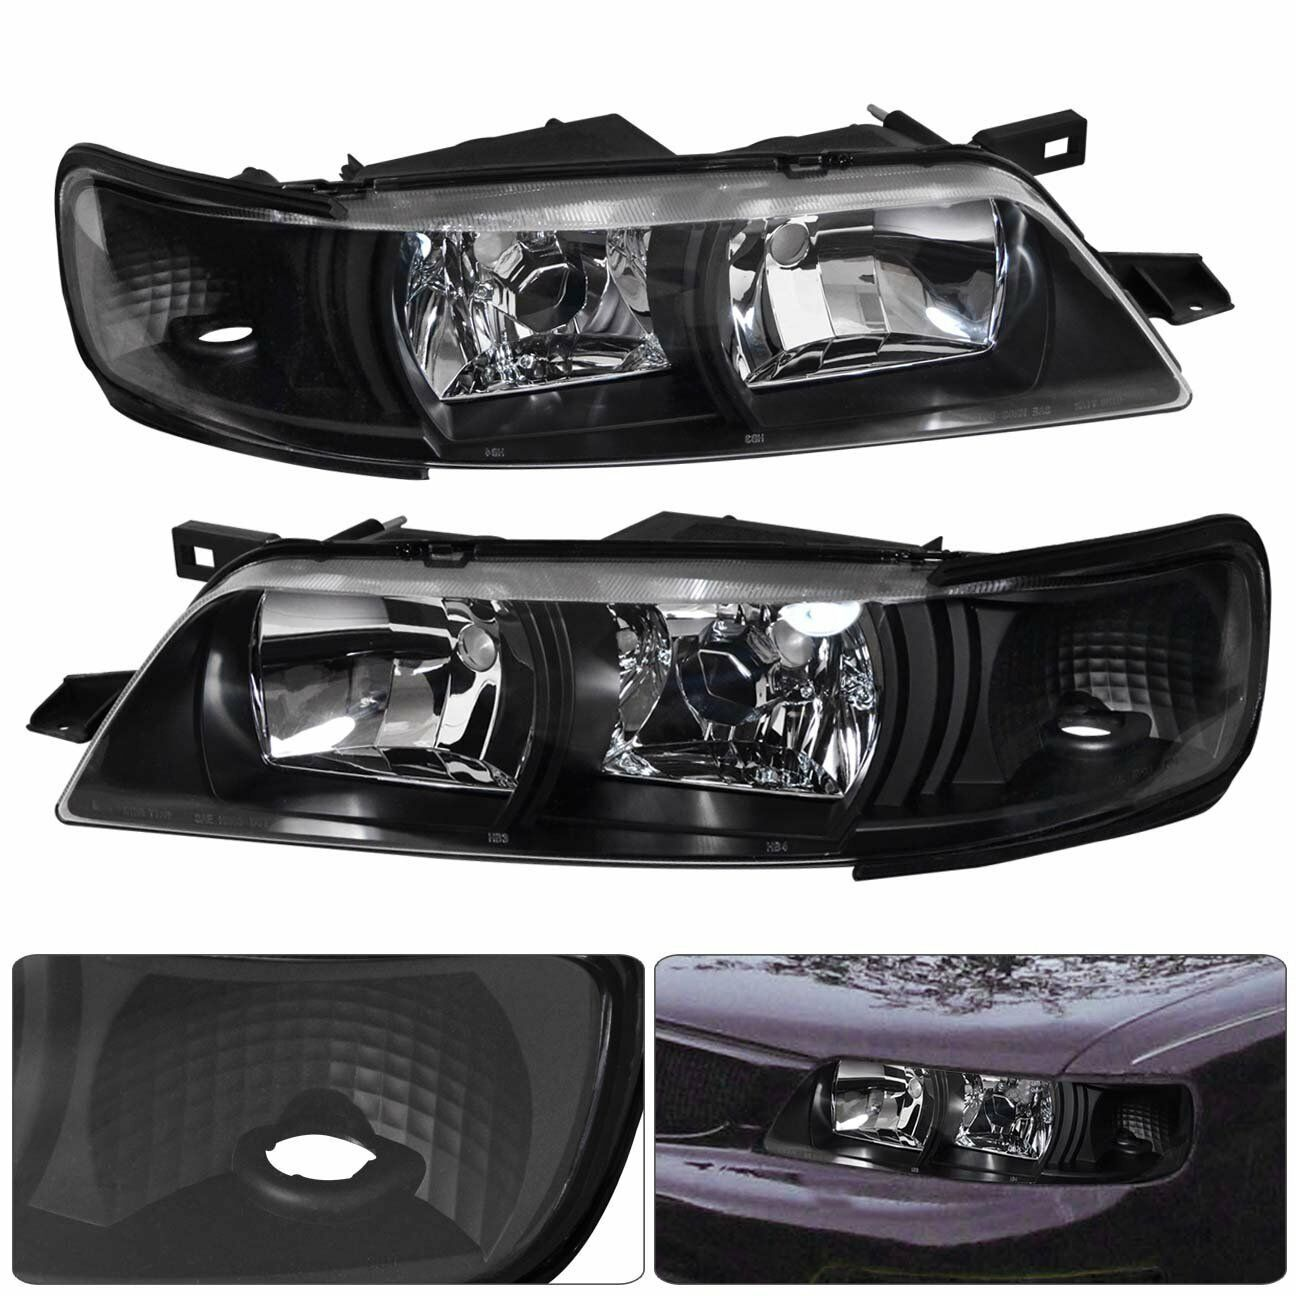 For 1995-1999 Nissan Maxima 95-99 Black Headlight Headlamp Clear ...